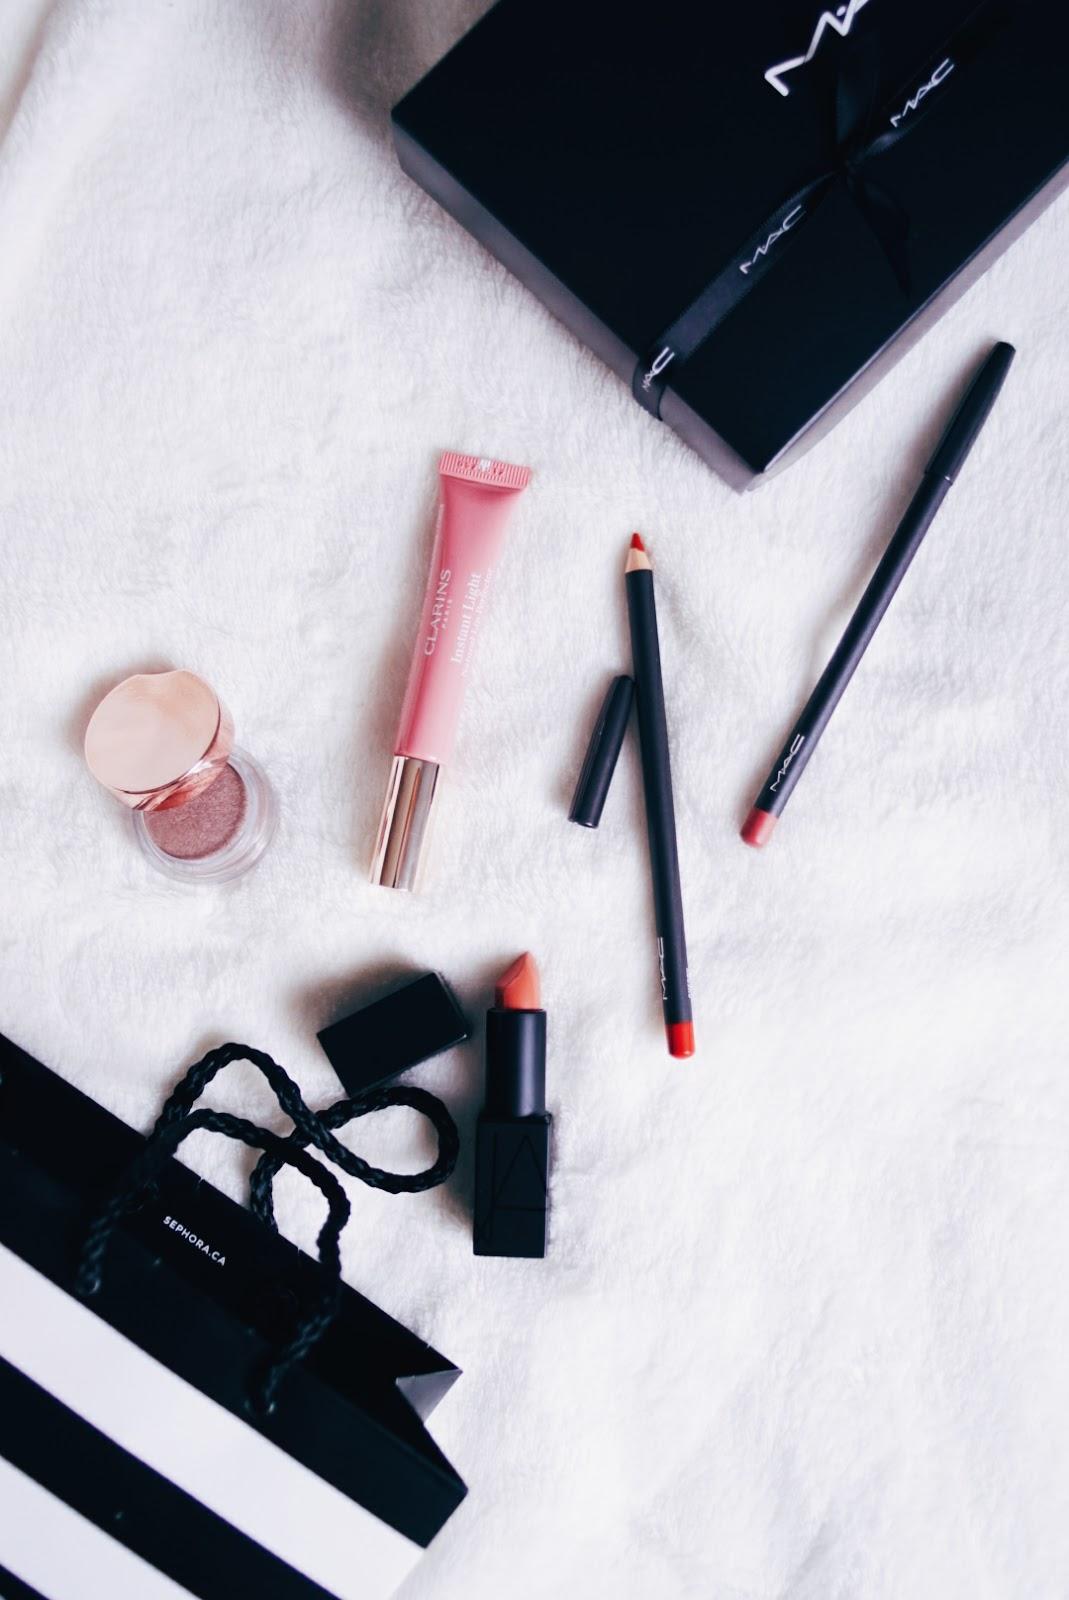 Clarins Spring 2016 Collection, Clarins Instant Light Natural Lip Perfector, MAC Lip Pencils, MAC Soar, MAC Cherry, NARS Audacious Lipstick, NARS Barbara